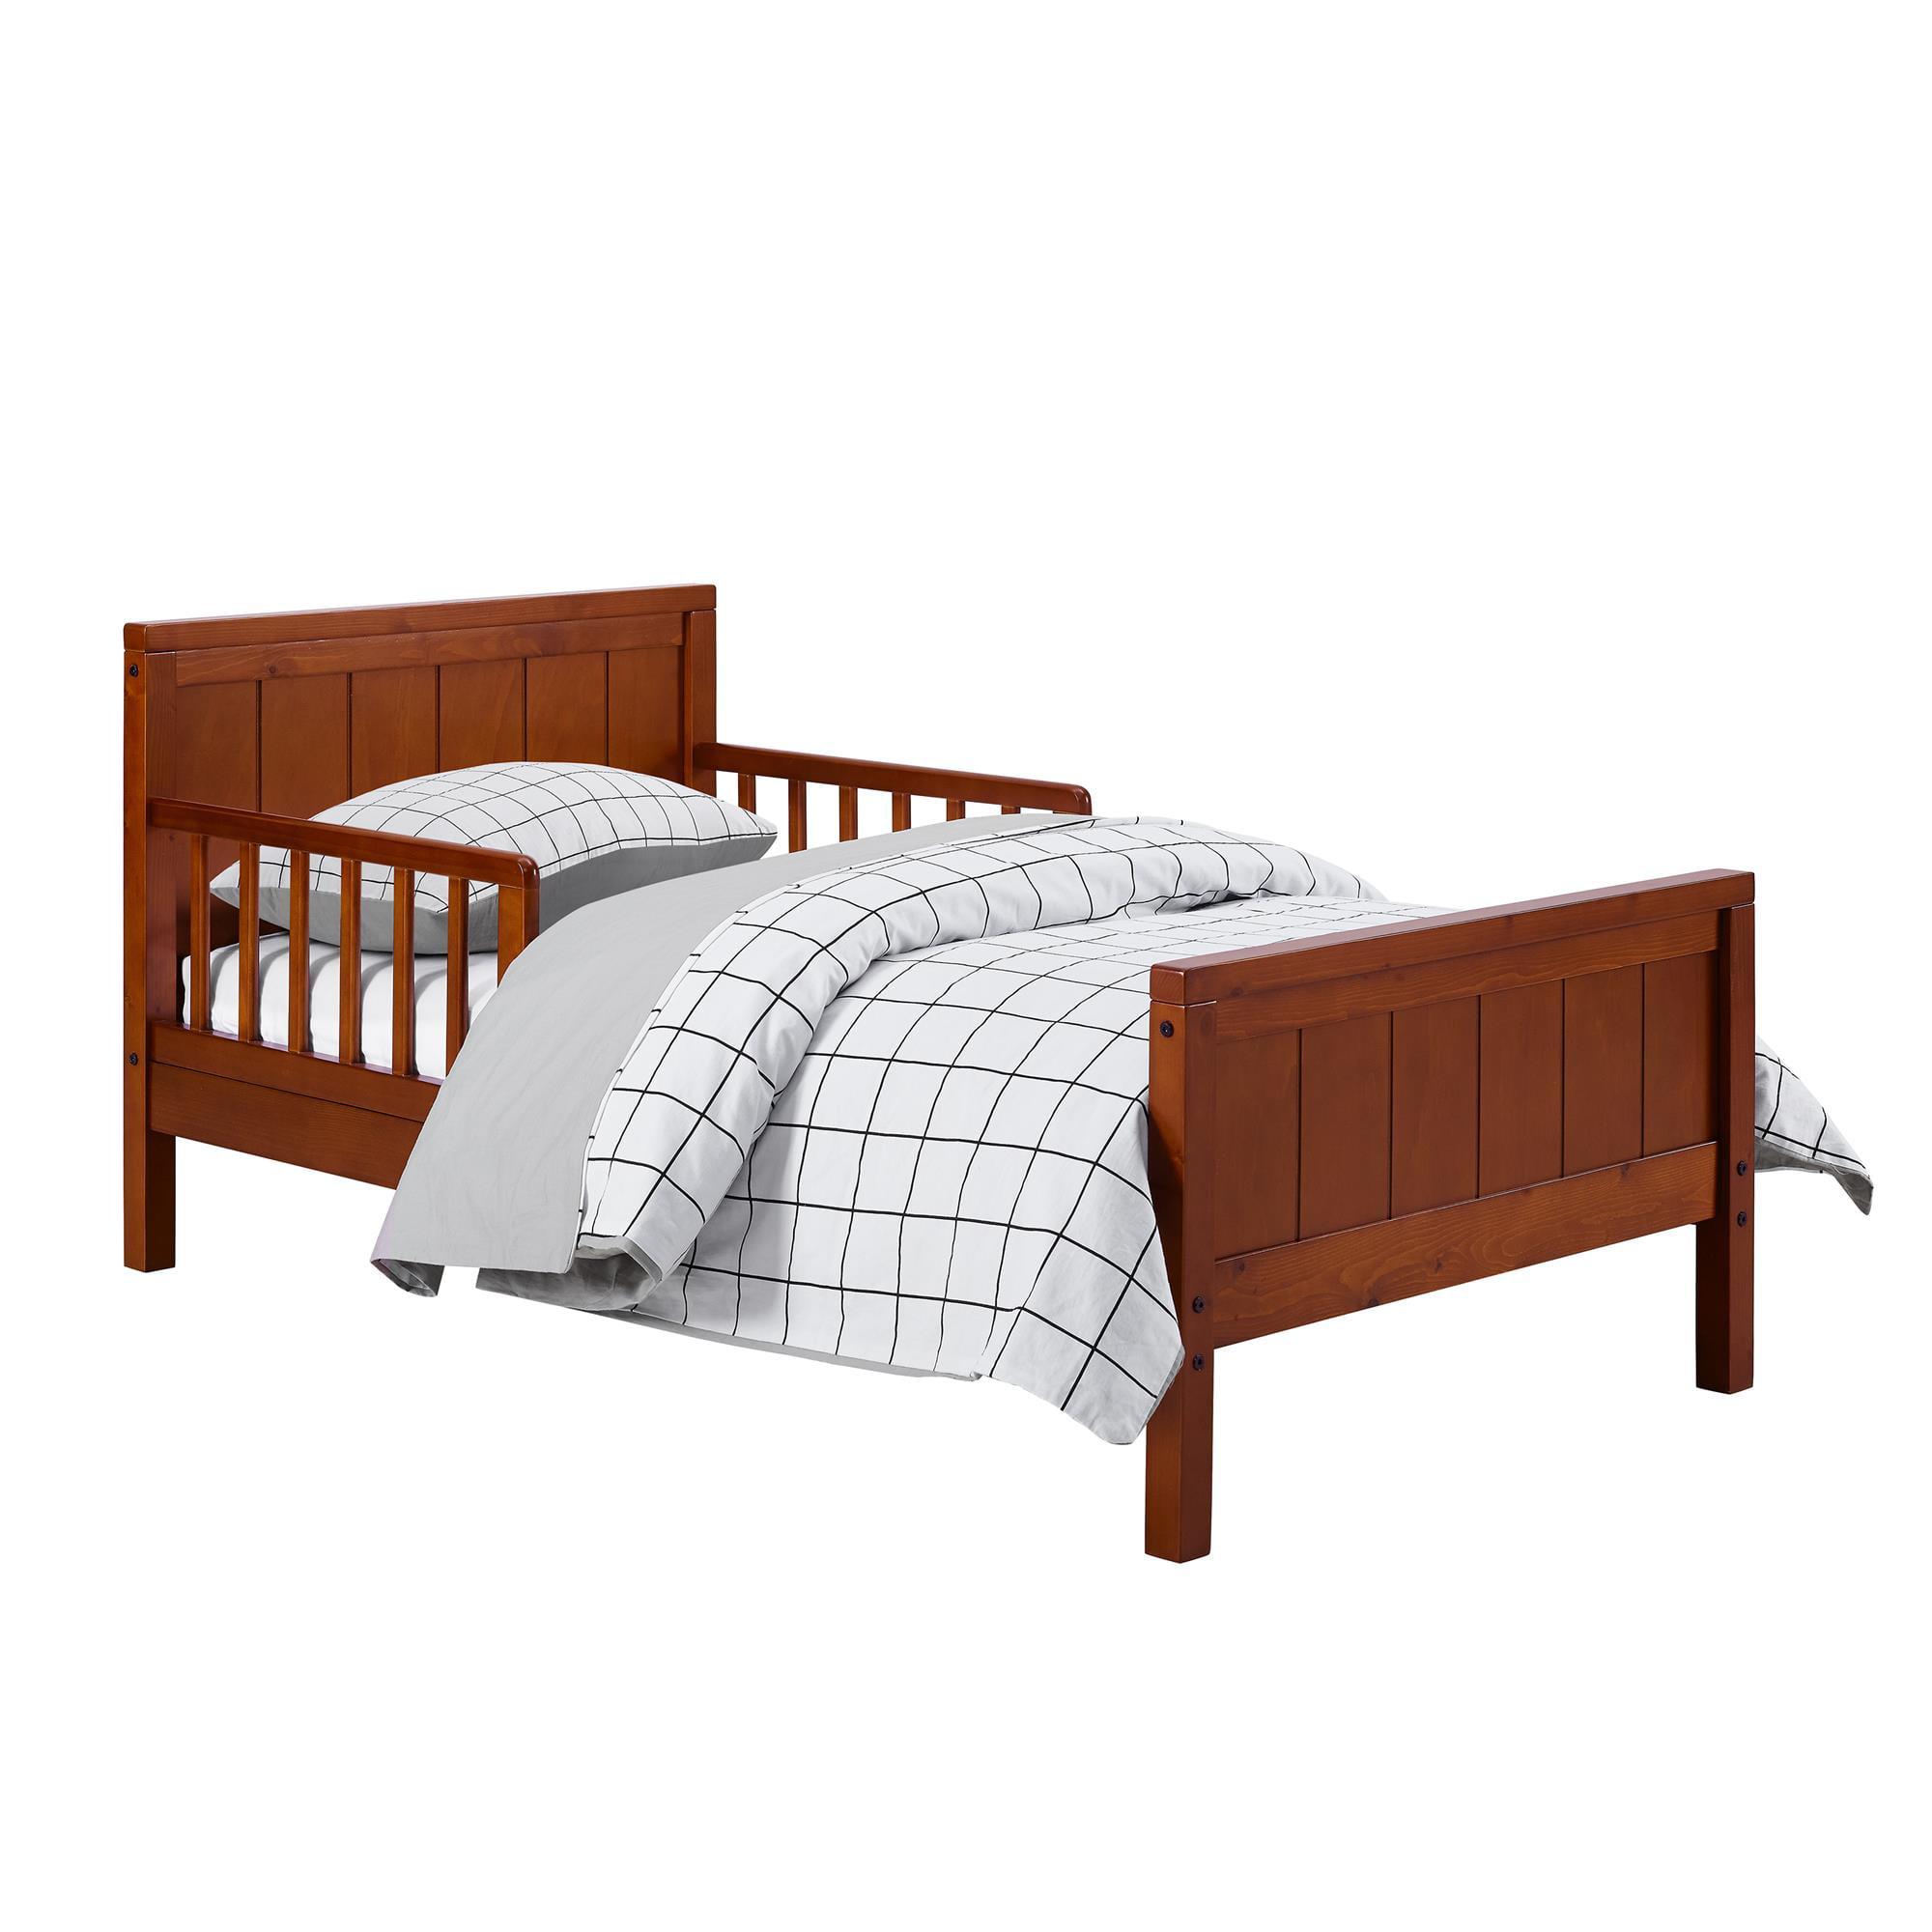 Baby Relax Nantucket Toddler Bed, Espresso